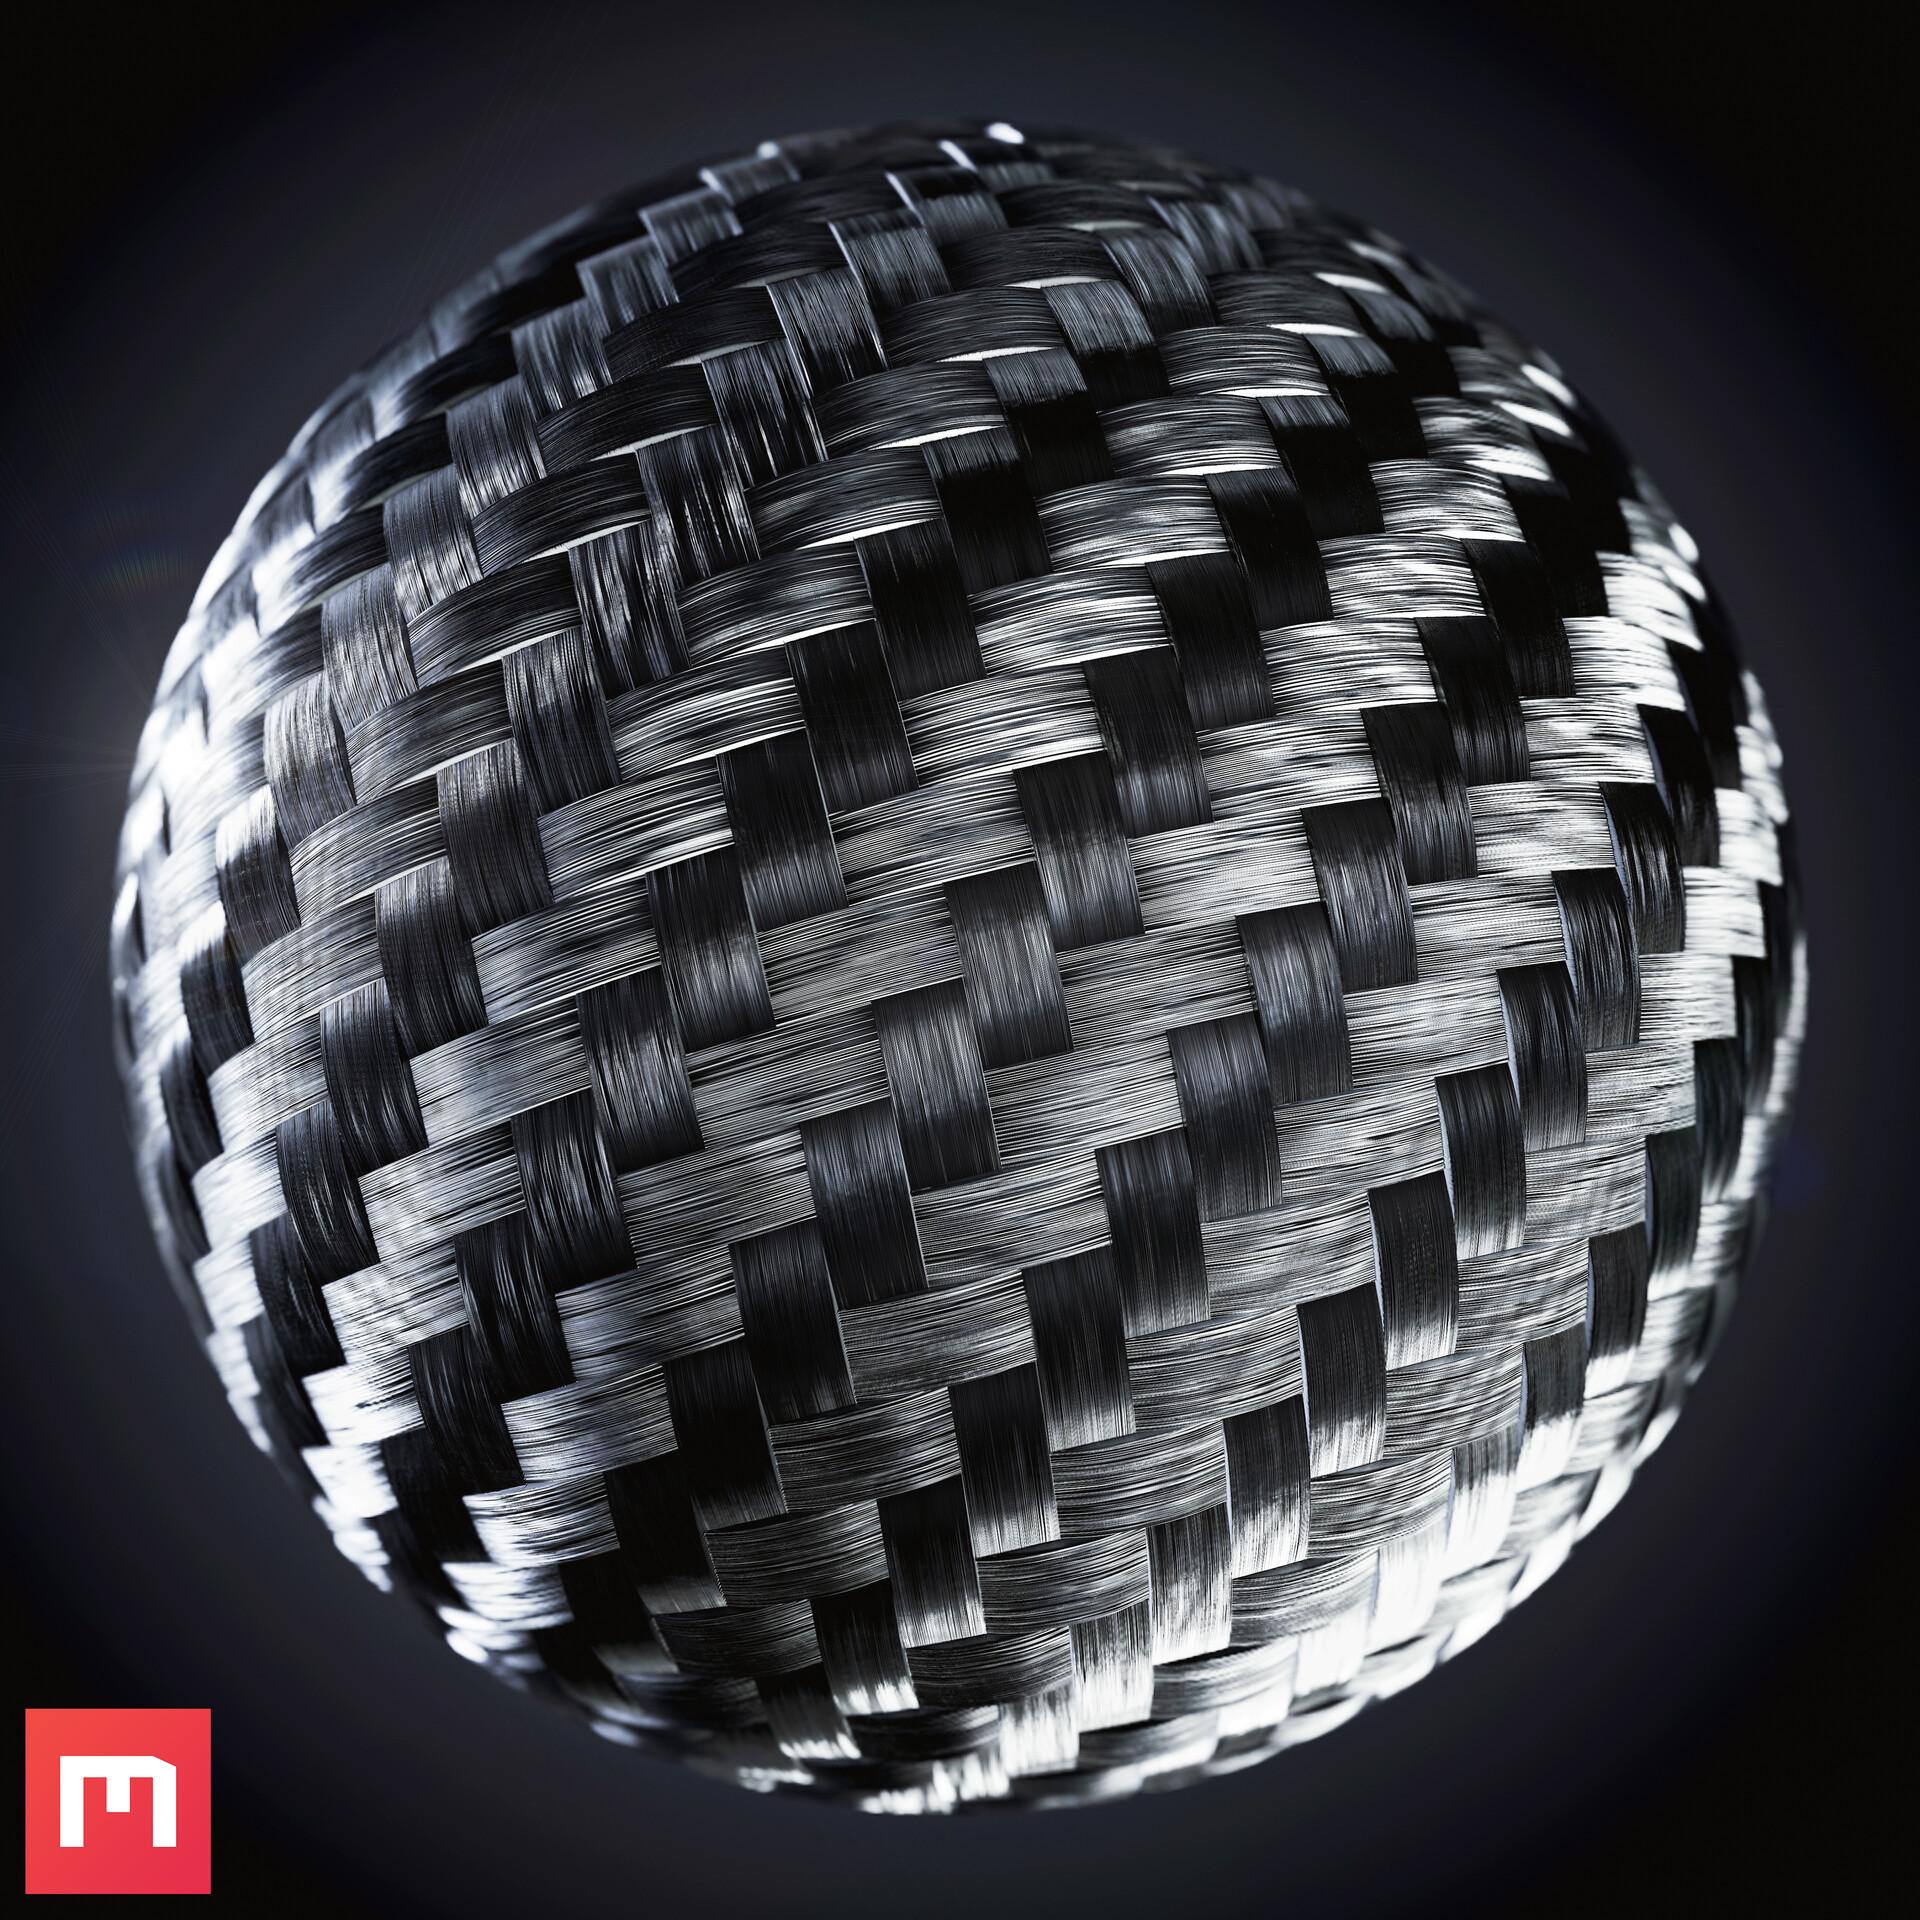 Base Render of Material. Tiling x1